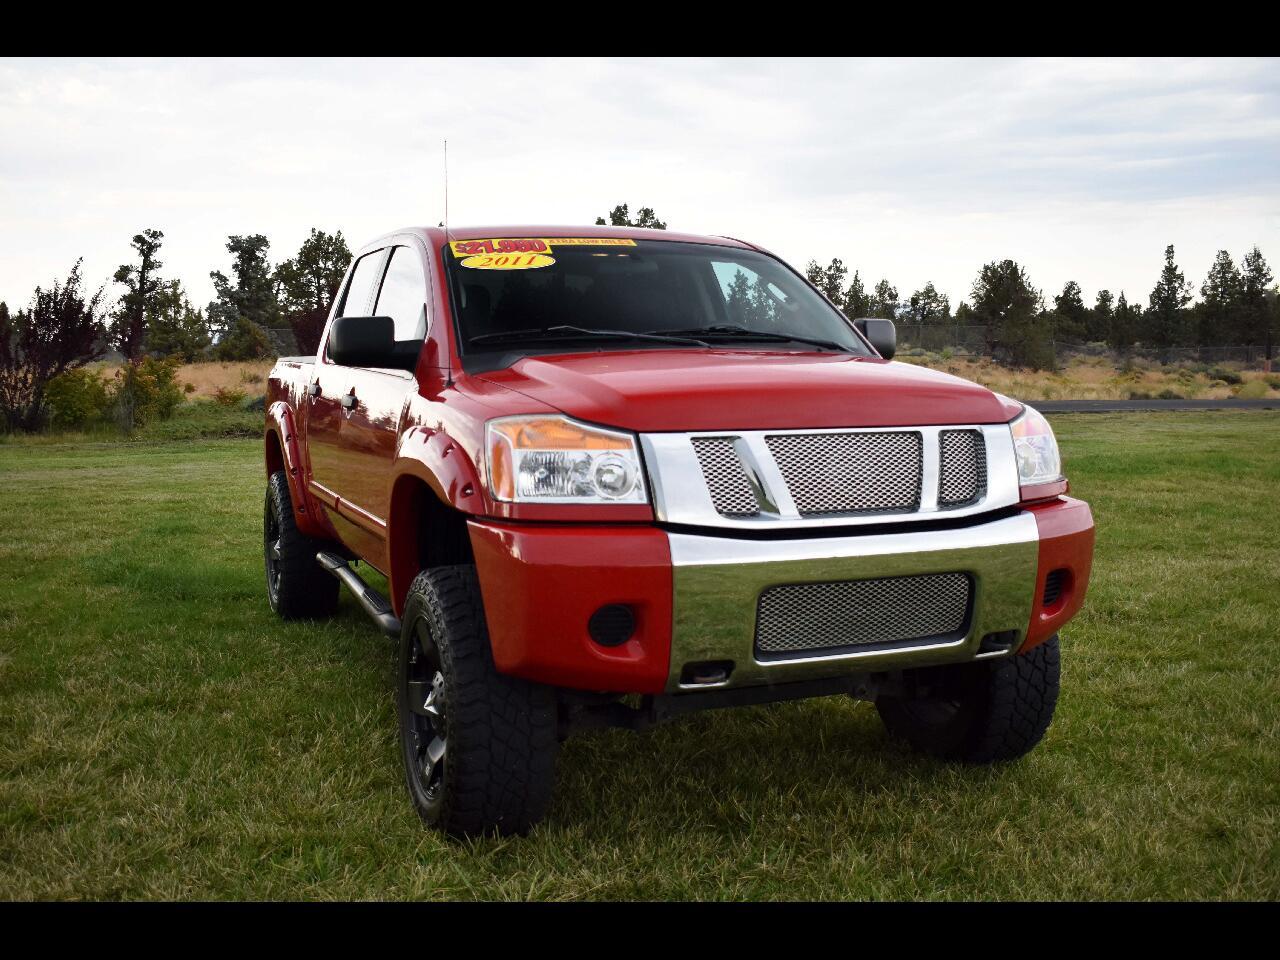 2011 Nissan Titan 4WD Crew Cab SWB SV**LOW MILES**